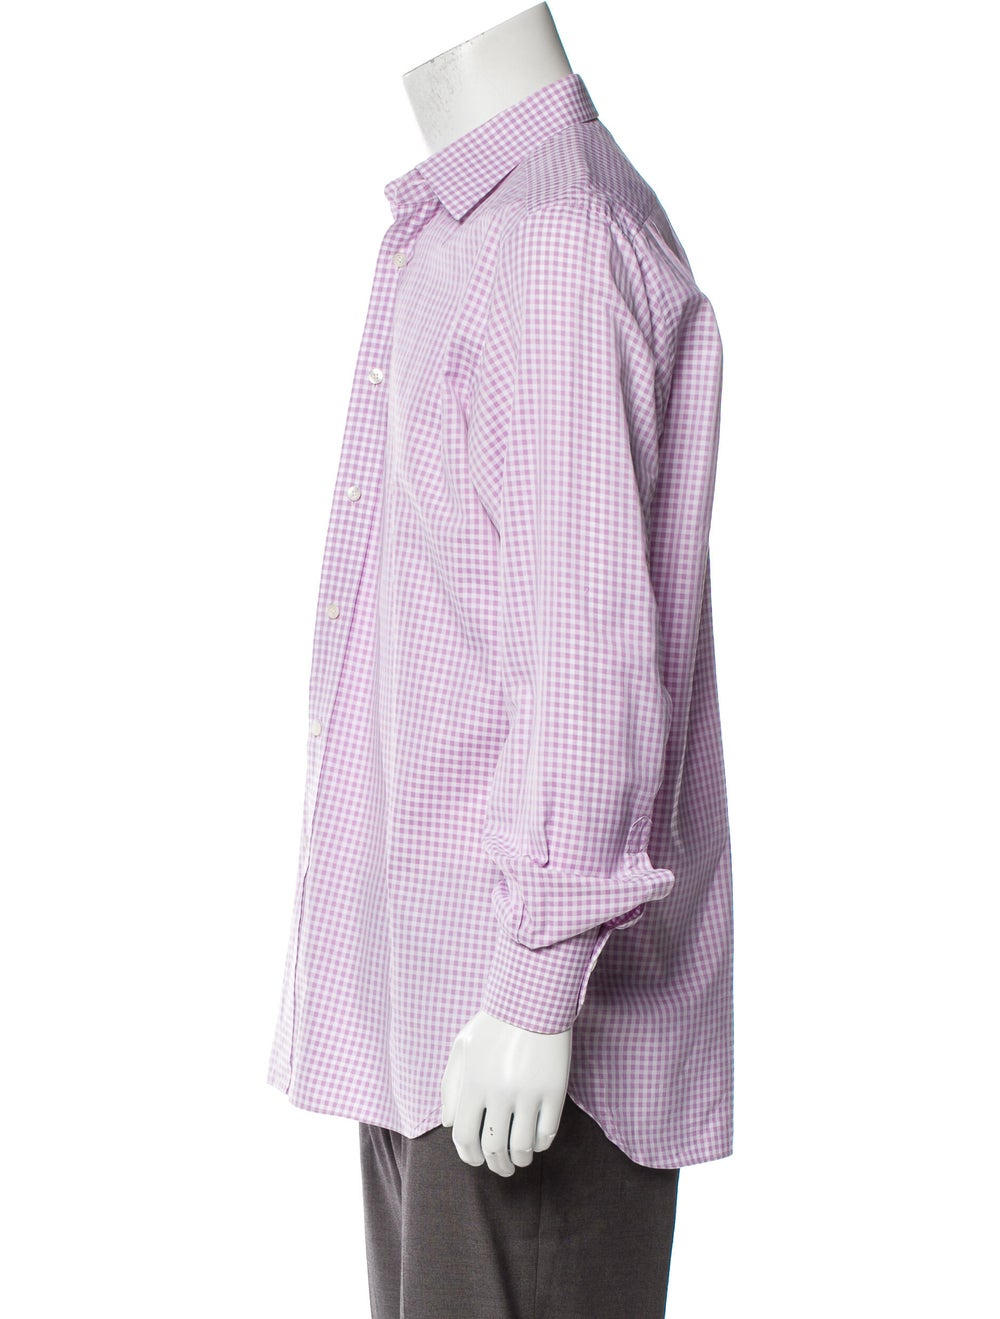 Tom Ford Gingham Dress Shirt pink - image 2